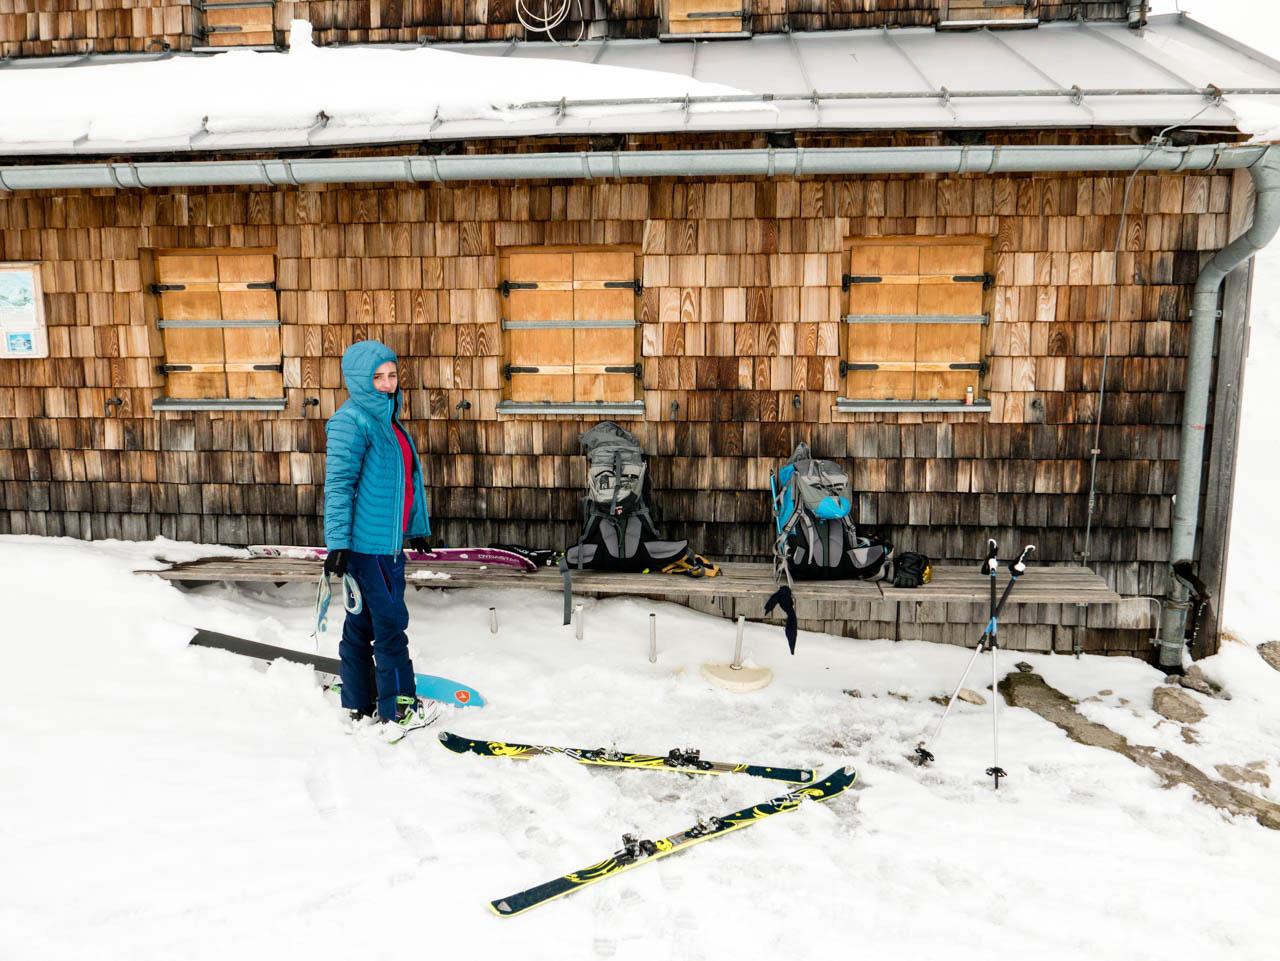 anja-woertge-mountainista-munichmountaingirls-berg-blog-muenchen-Skitour-zur-Coburger-Huette-seebensee